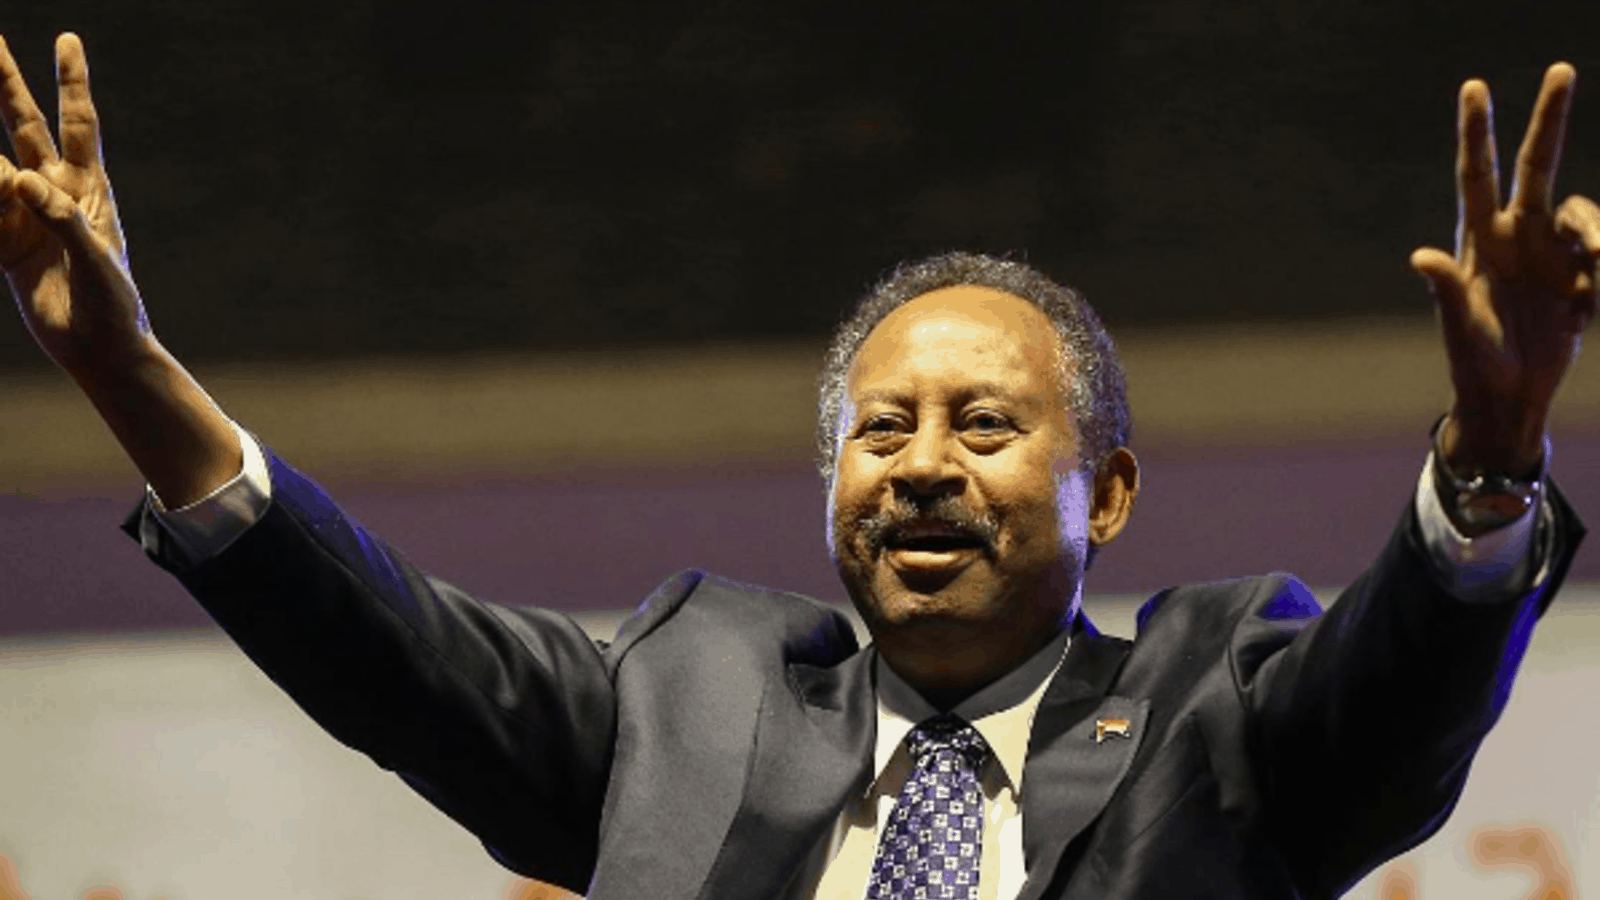 Assassination Attempt on Sudanese PM Shocks Khartoum